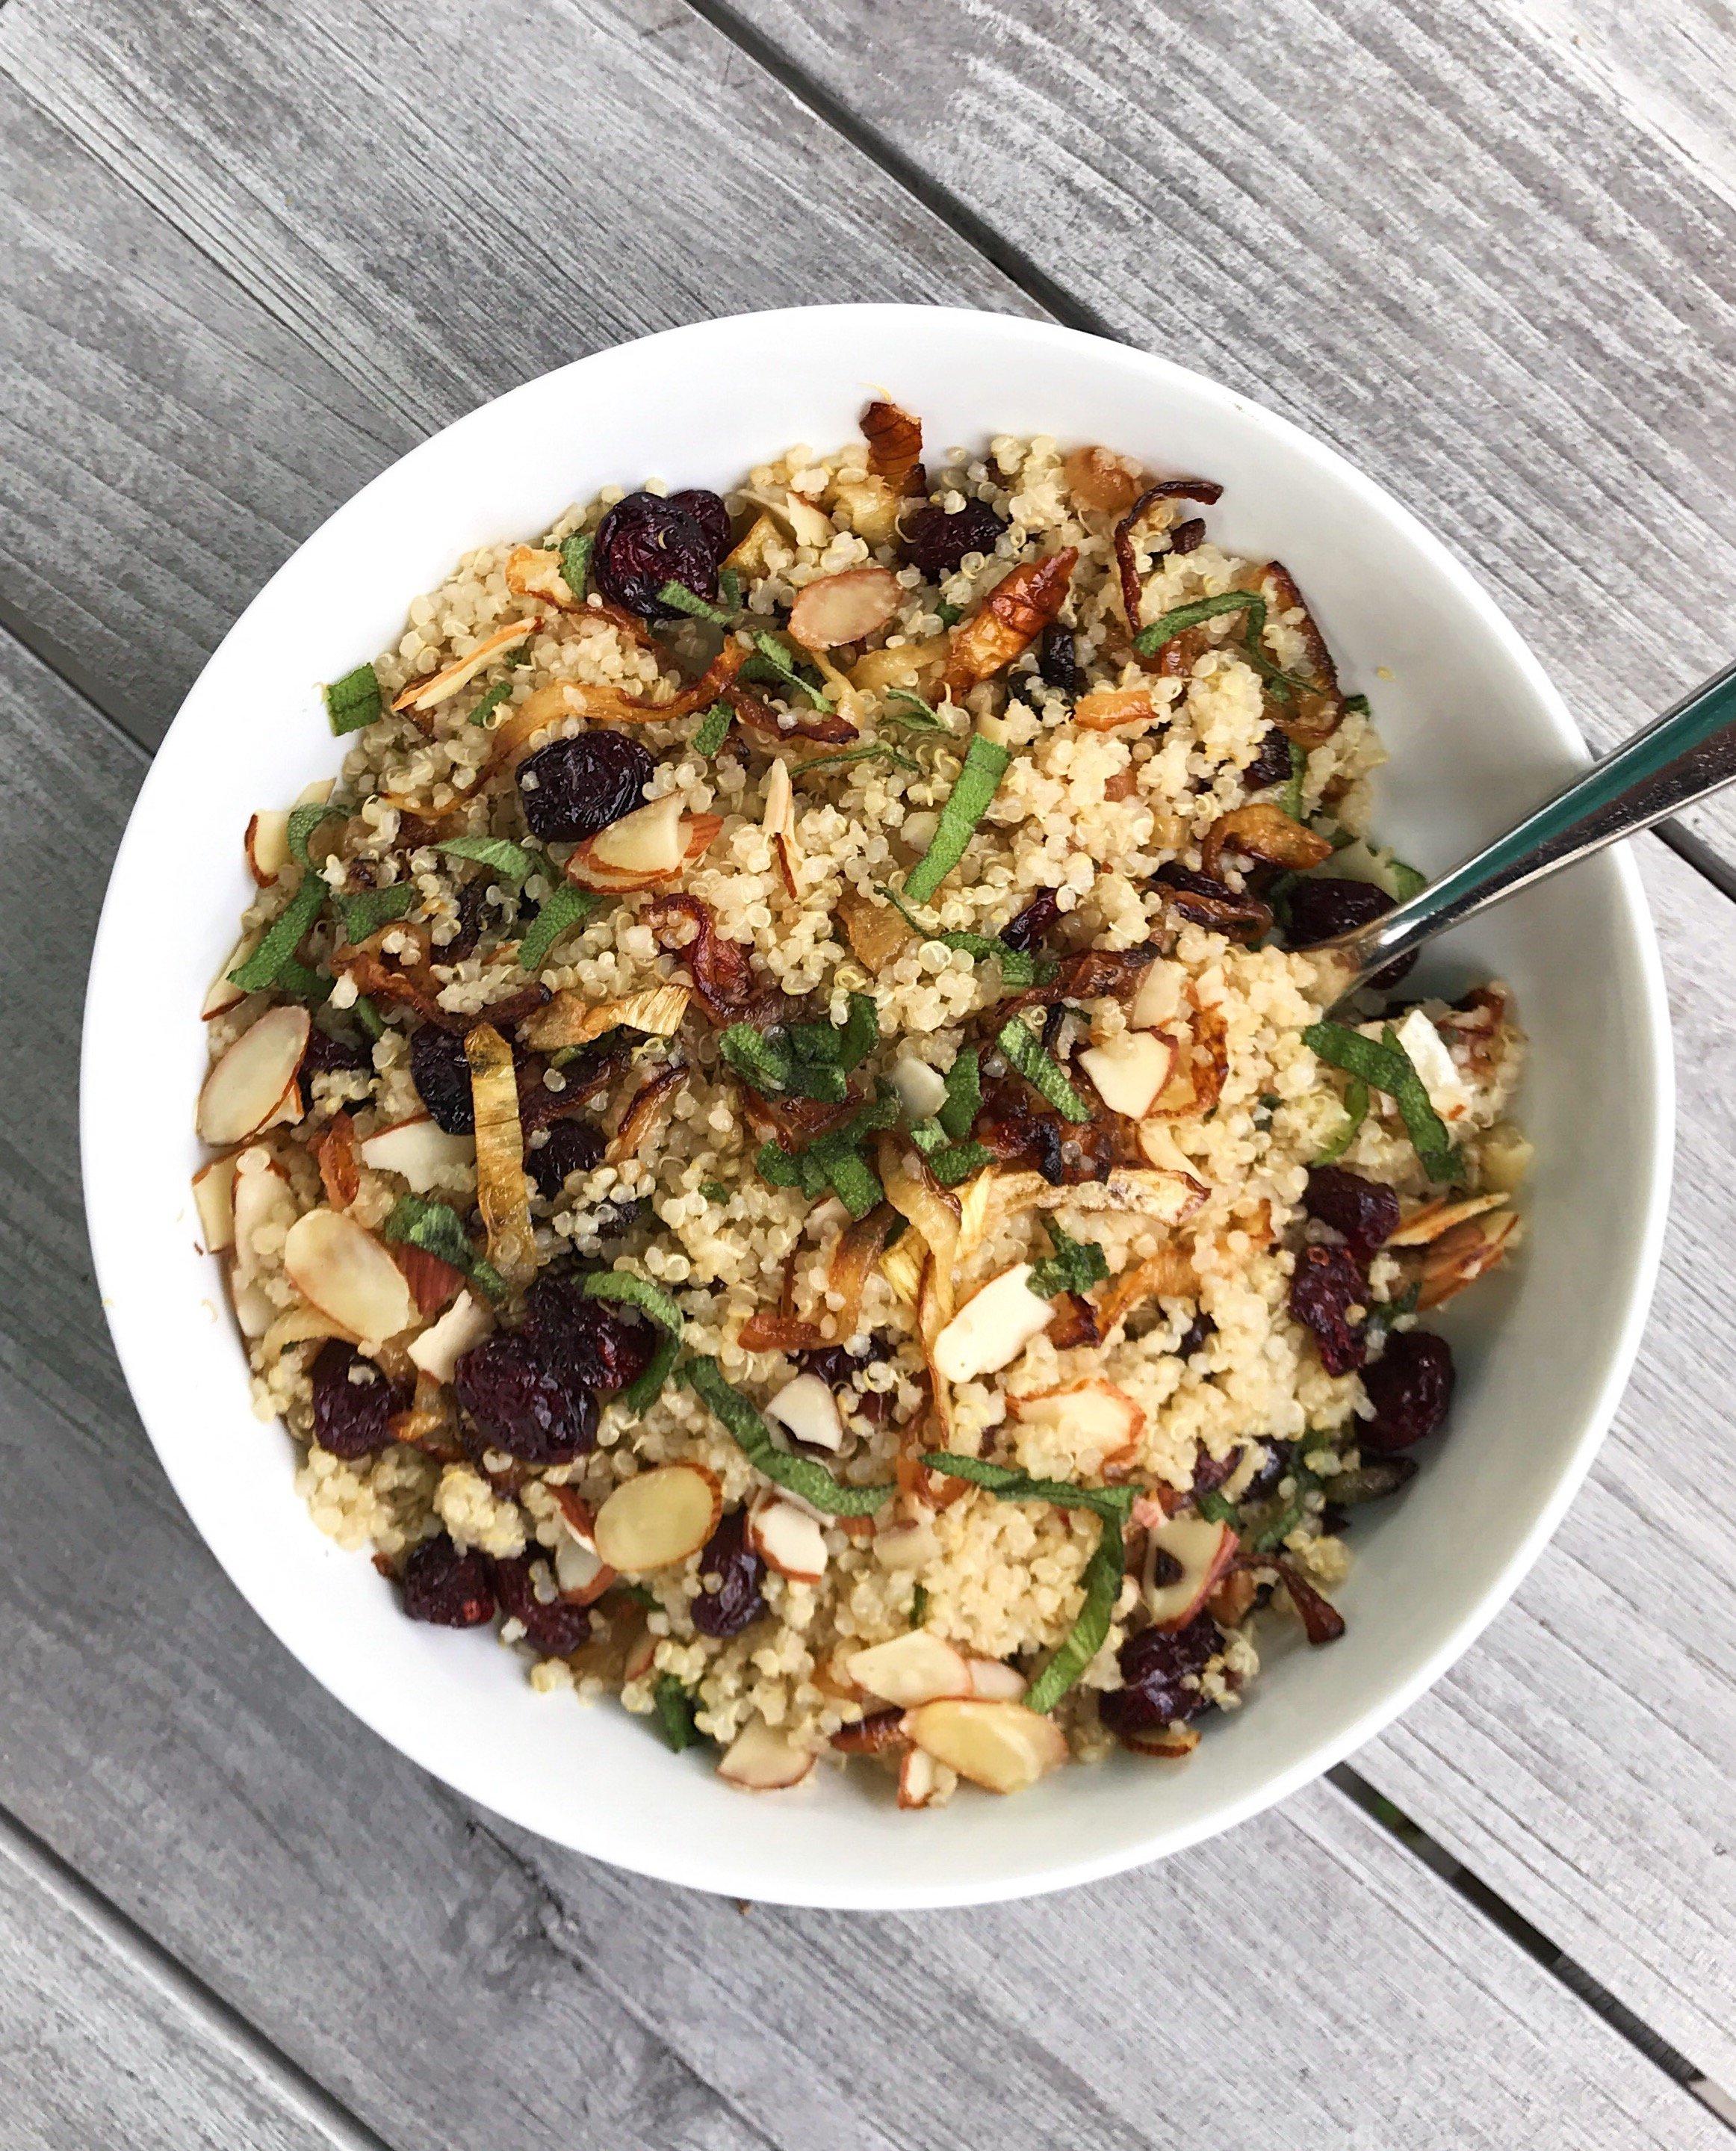 Gluten-Free Fall Quinoa Salad #glutenfree #glutenfreerecipes www.healthygffamily